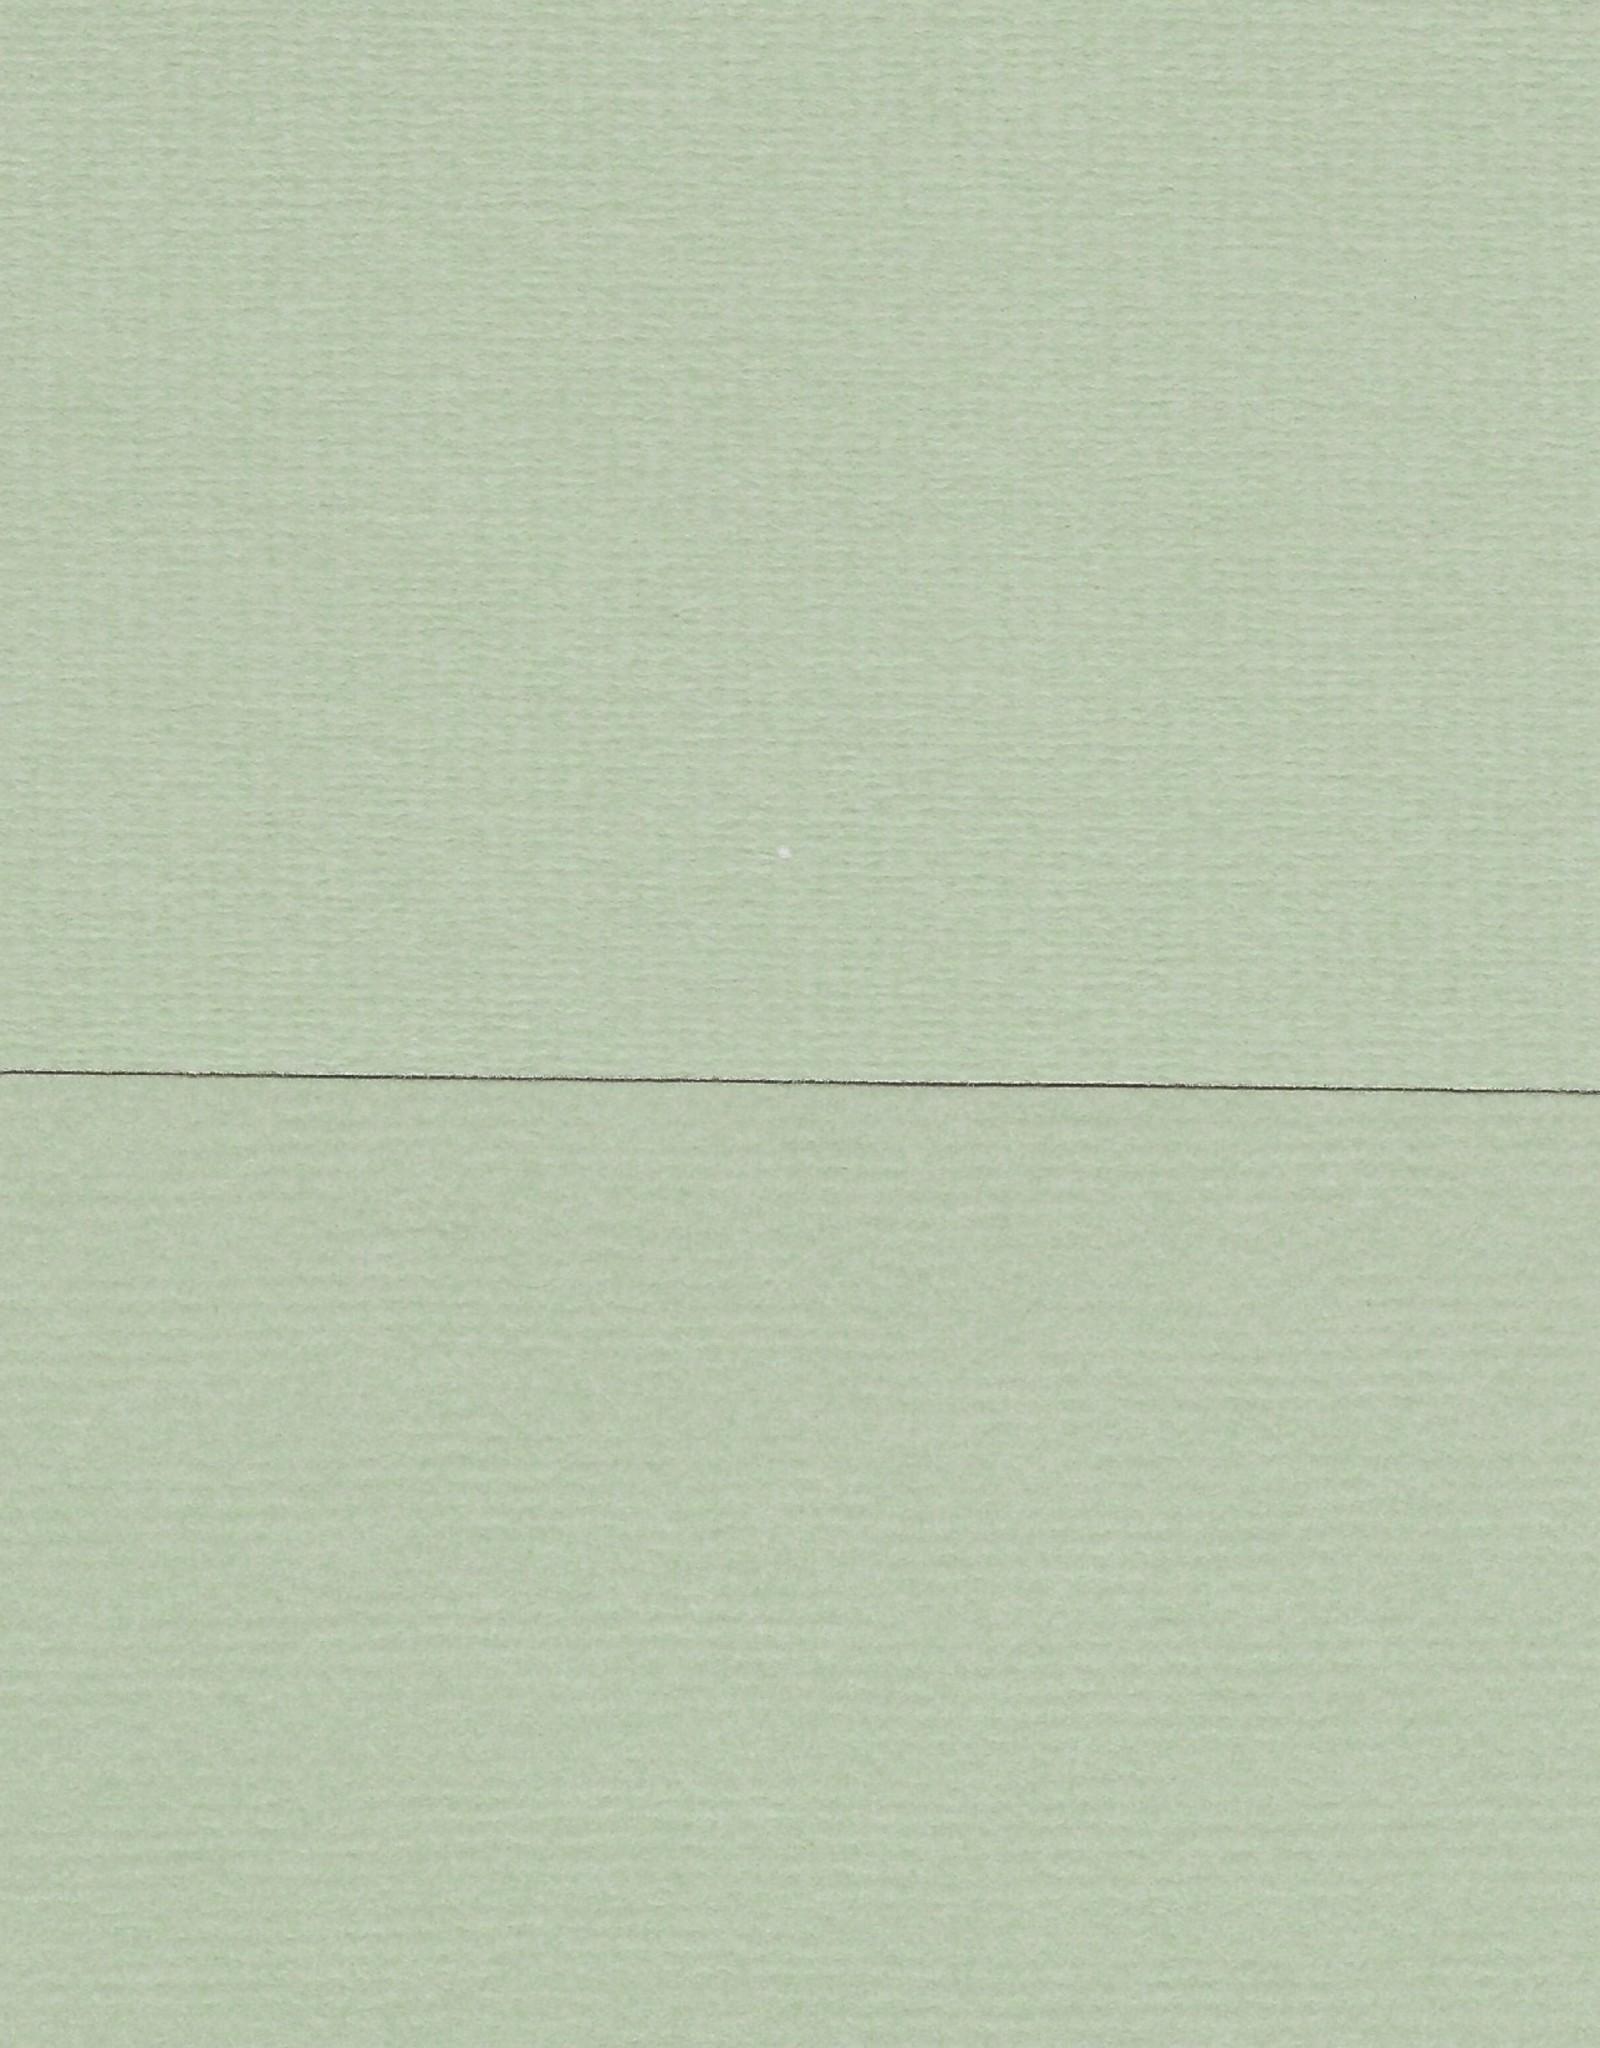 "Hahnemuhle Bugra, Mint #308, 33"" x 41"" 130 gsm"